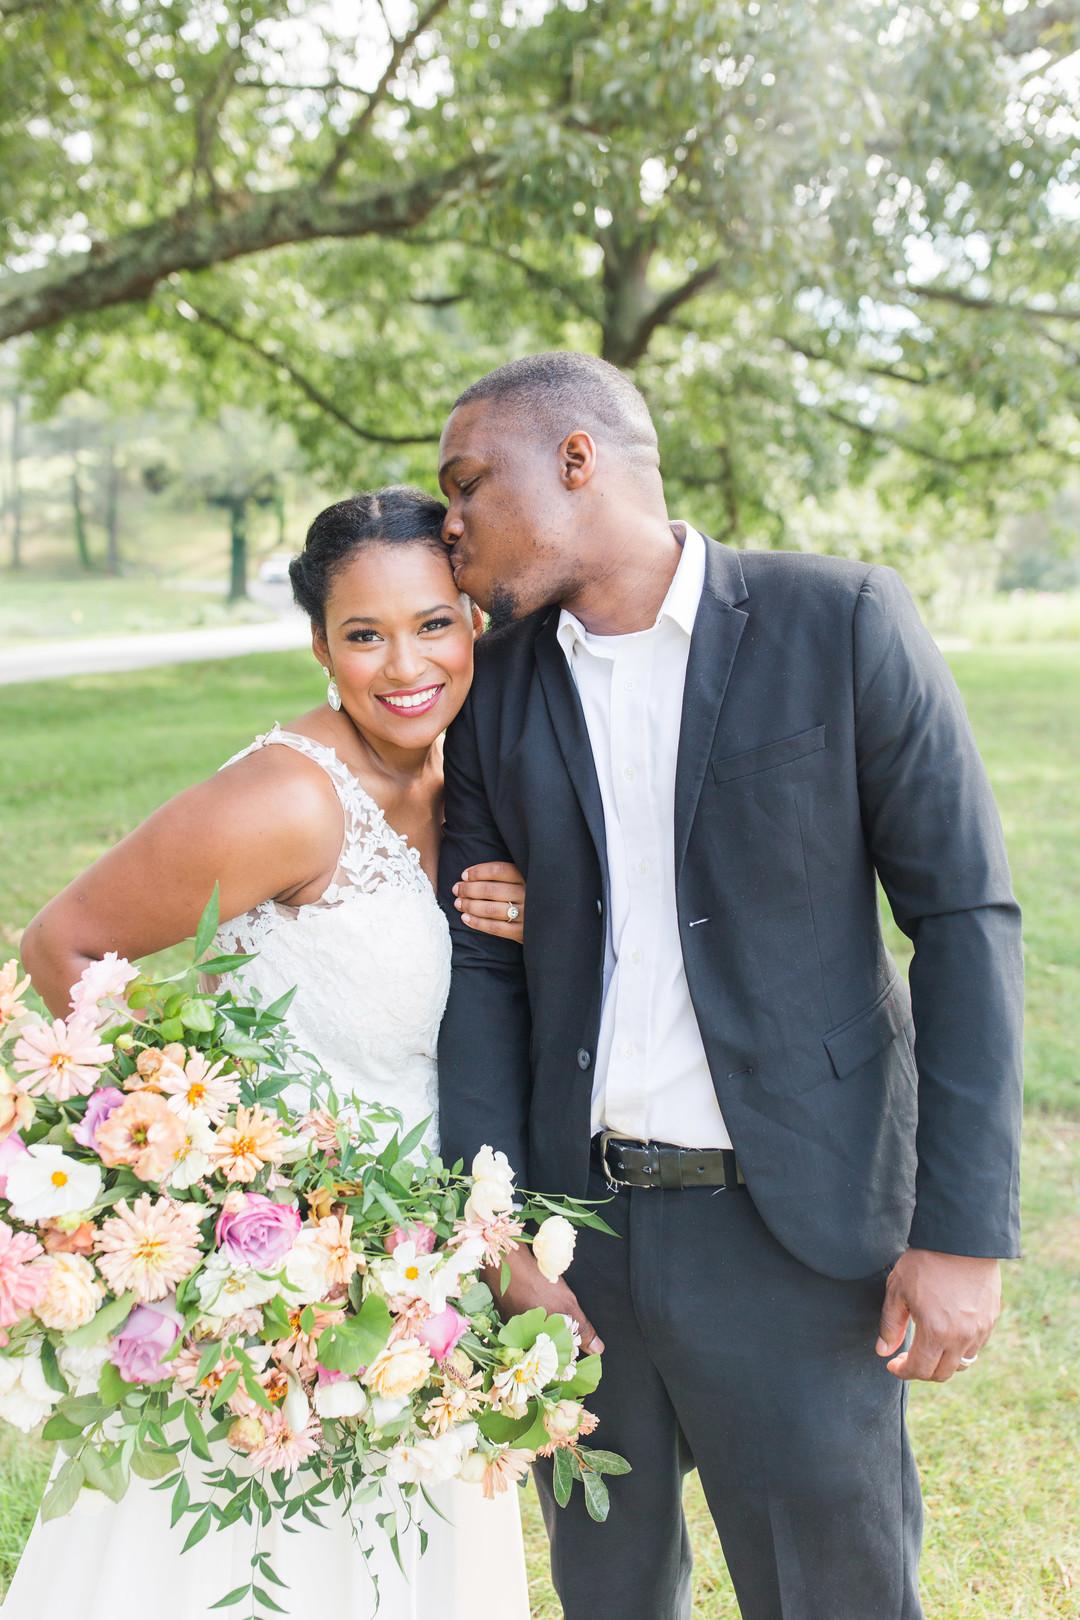 black bride and groom smiling